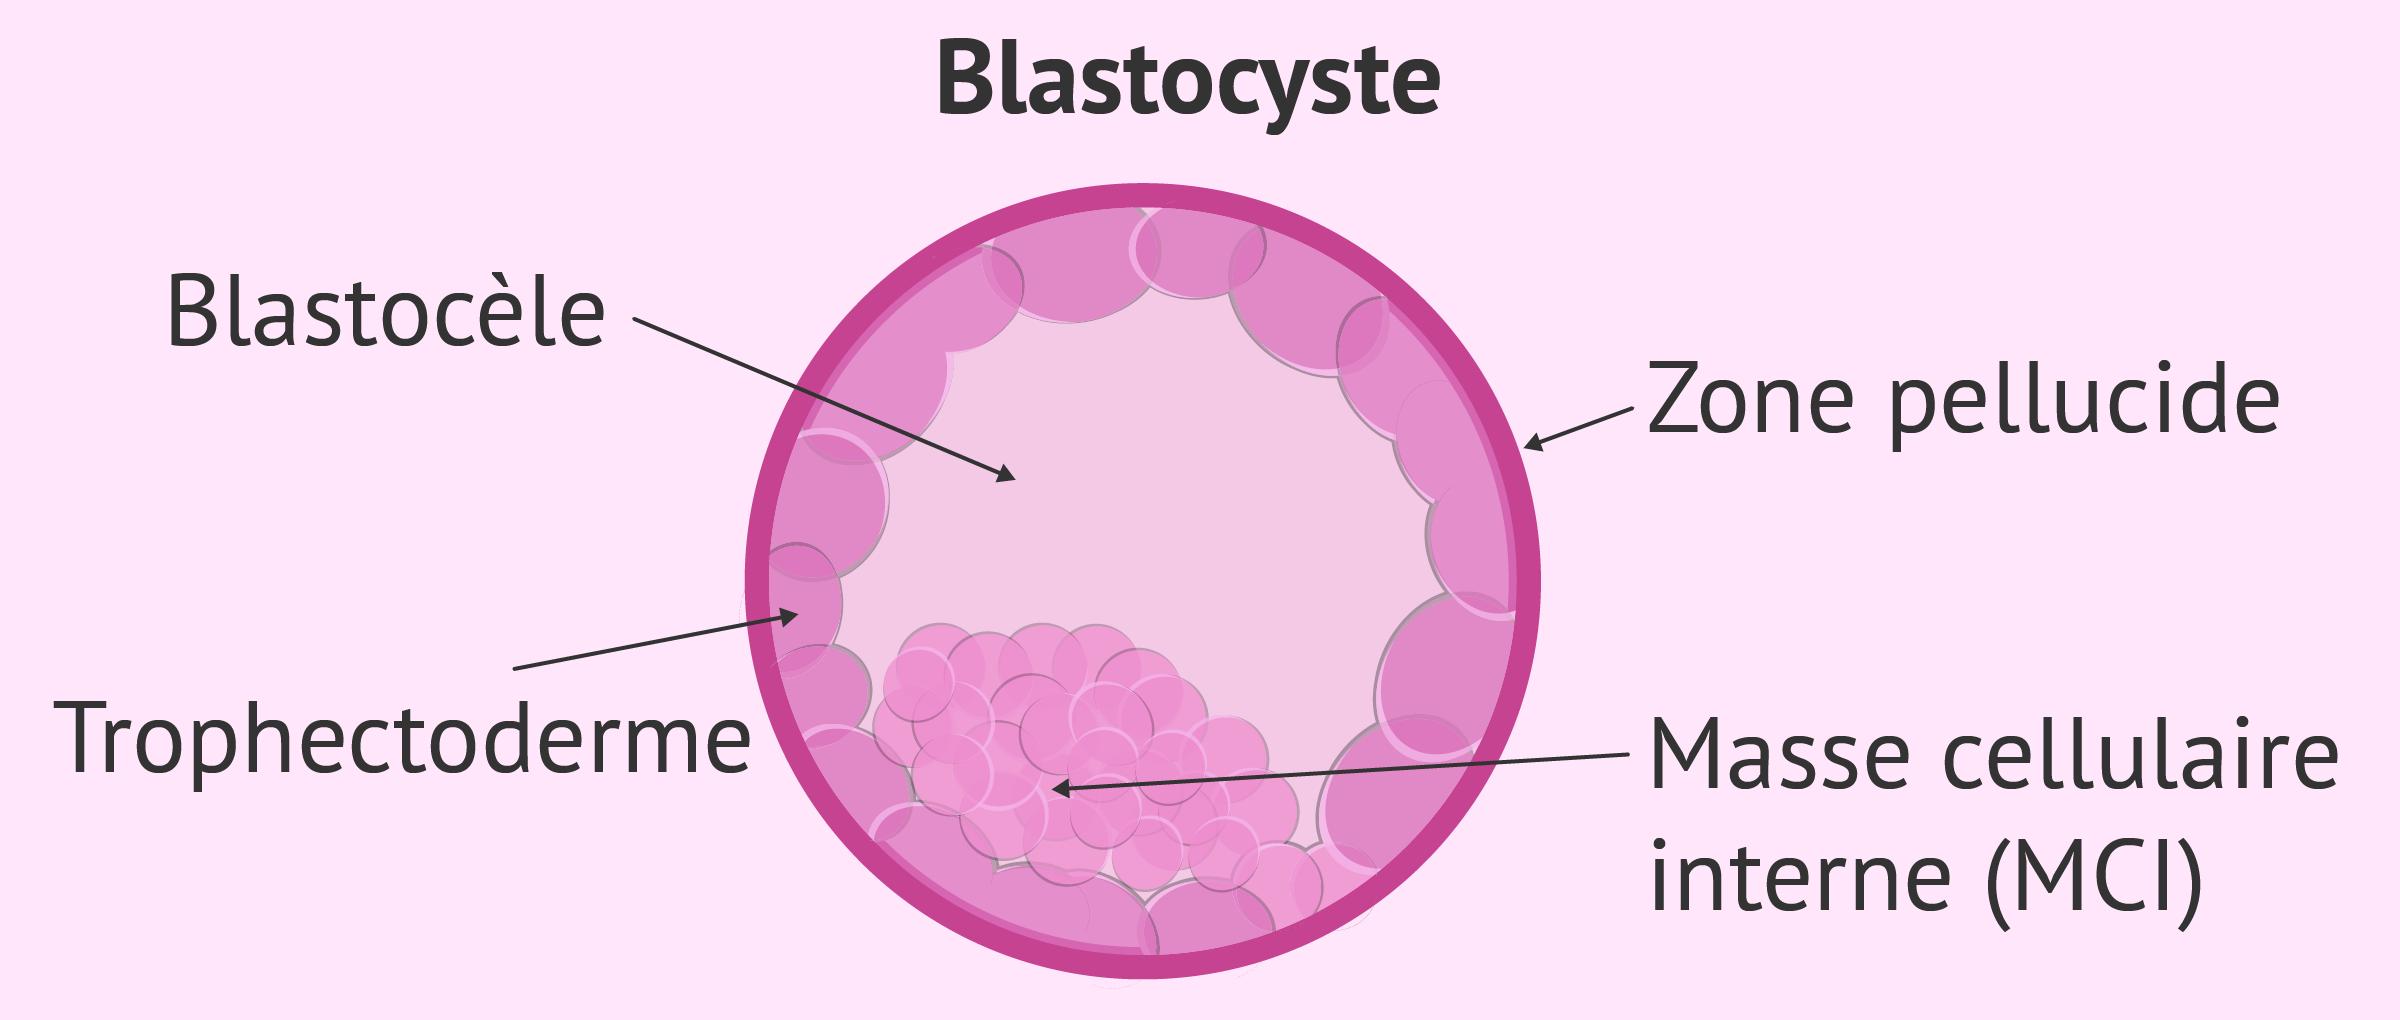 Stade embryonnaire : blastocyste